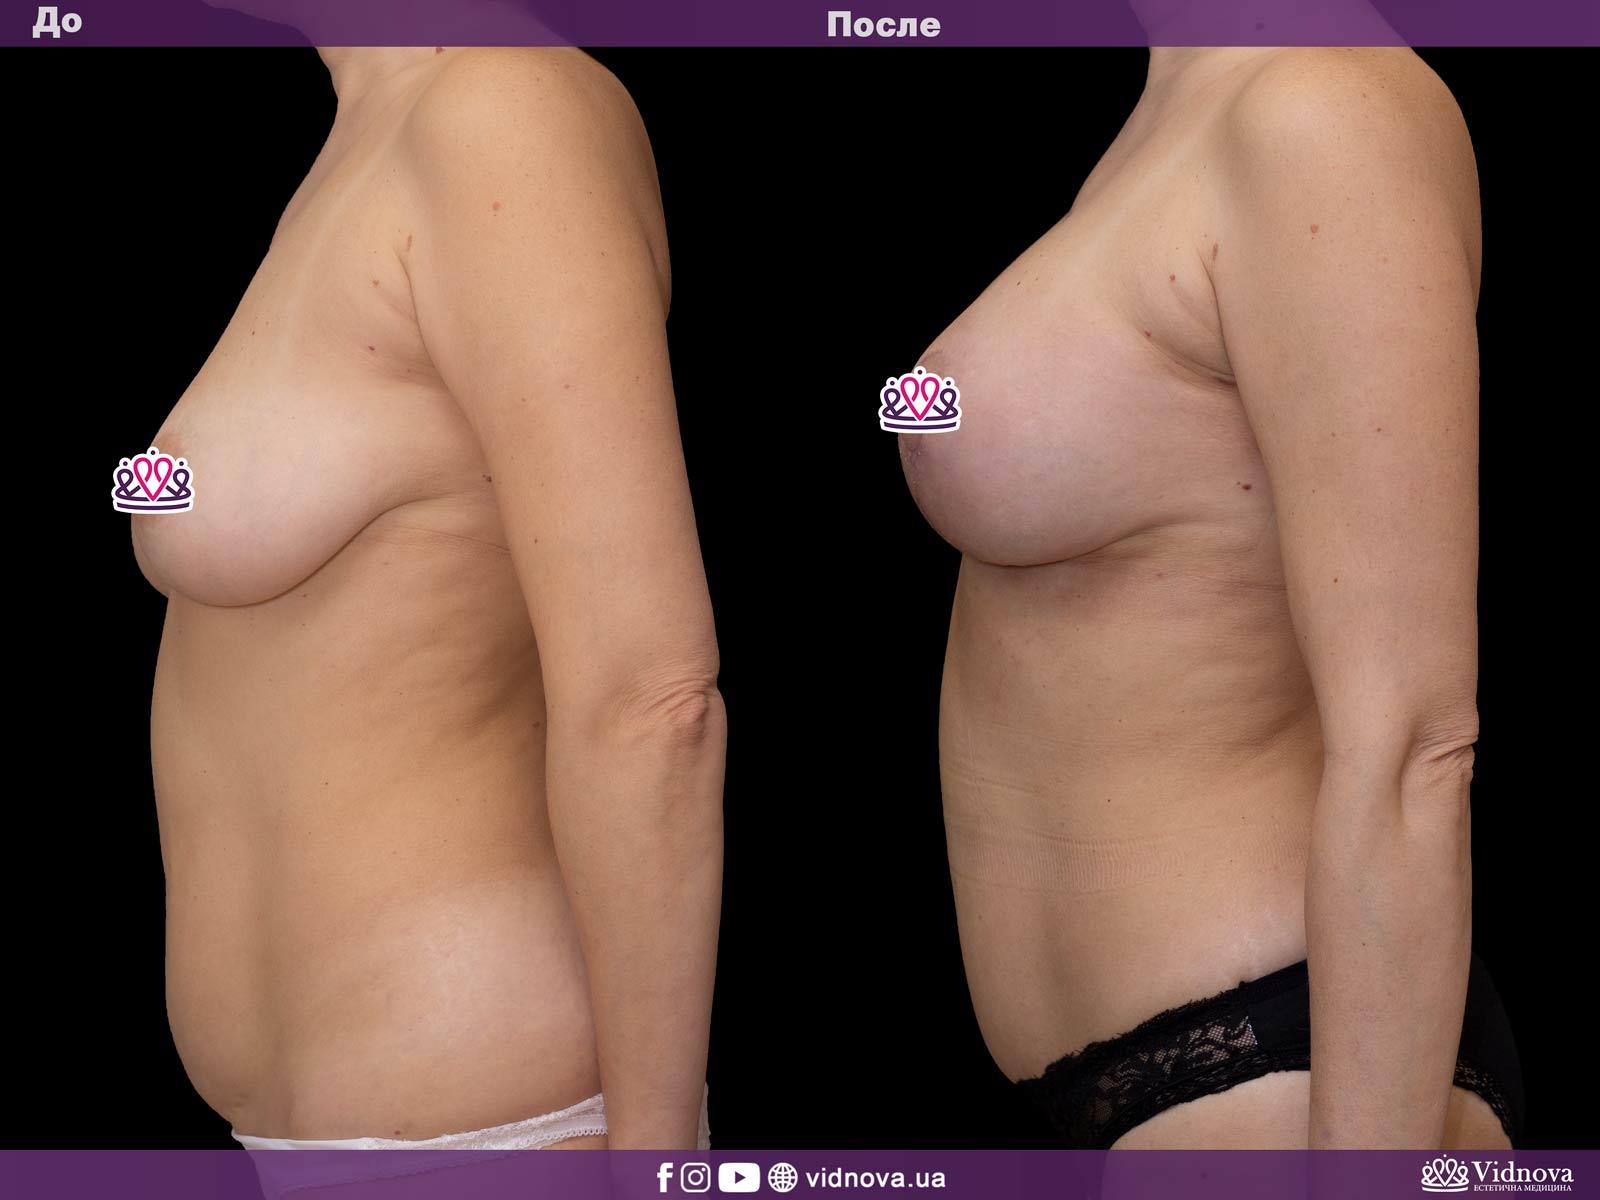 Подтяжка груди: Фото ДО и ПОСЛЕ - Пример №15-3 - Клиника Vidnova